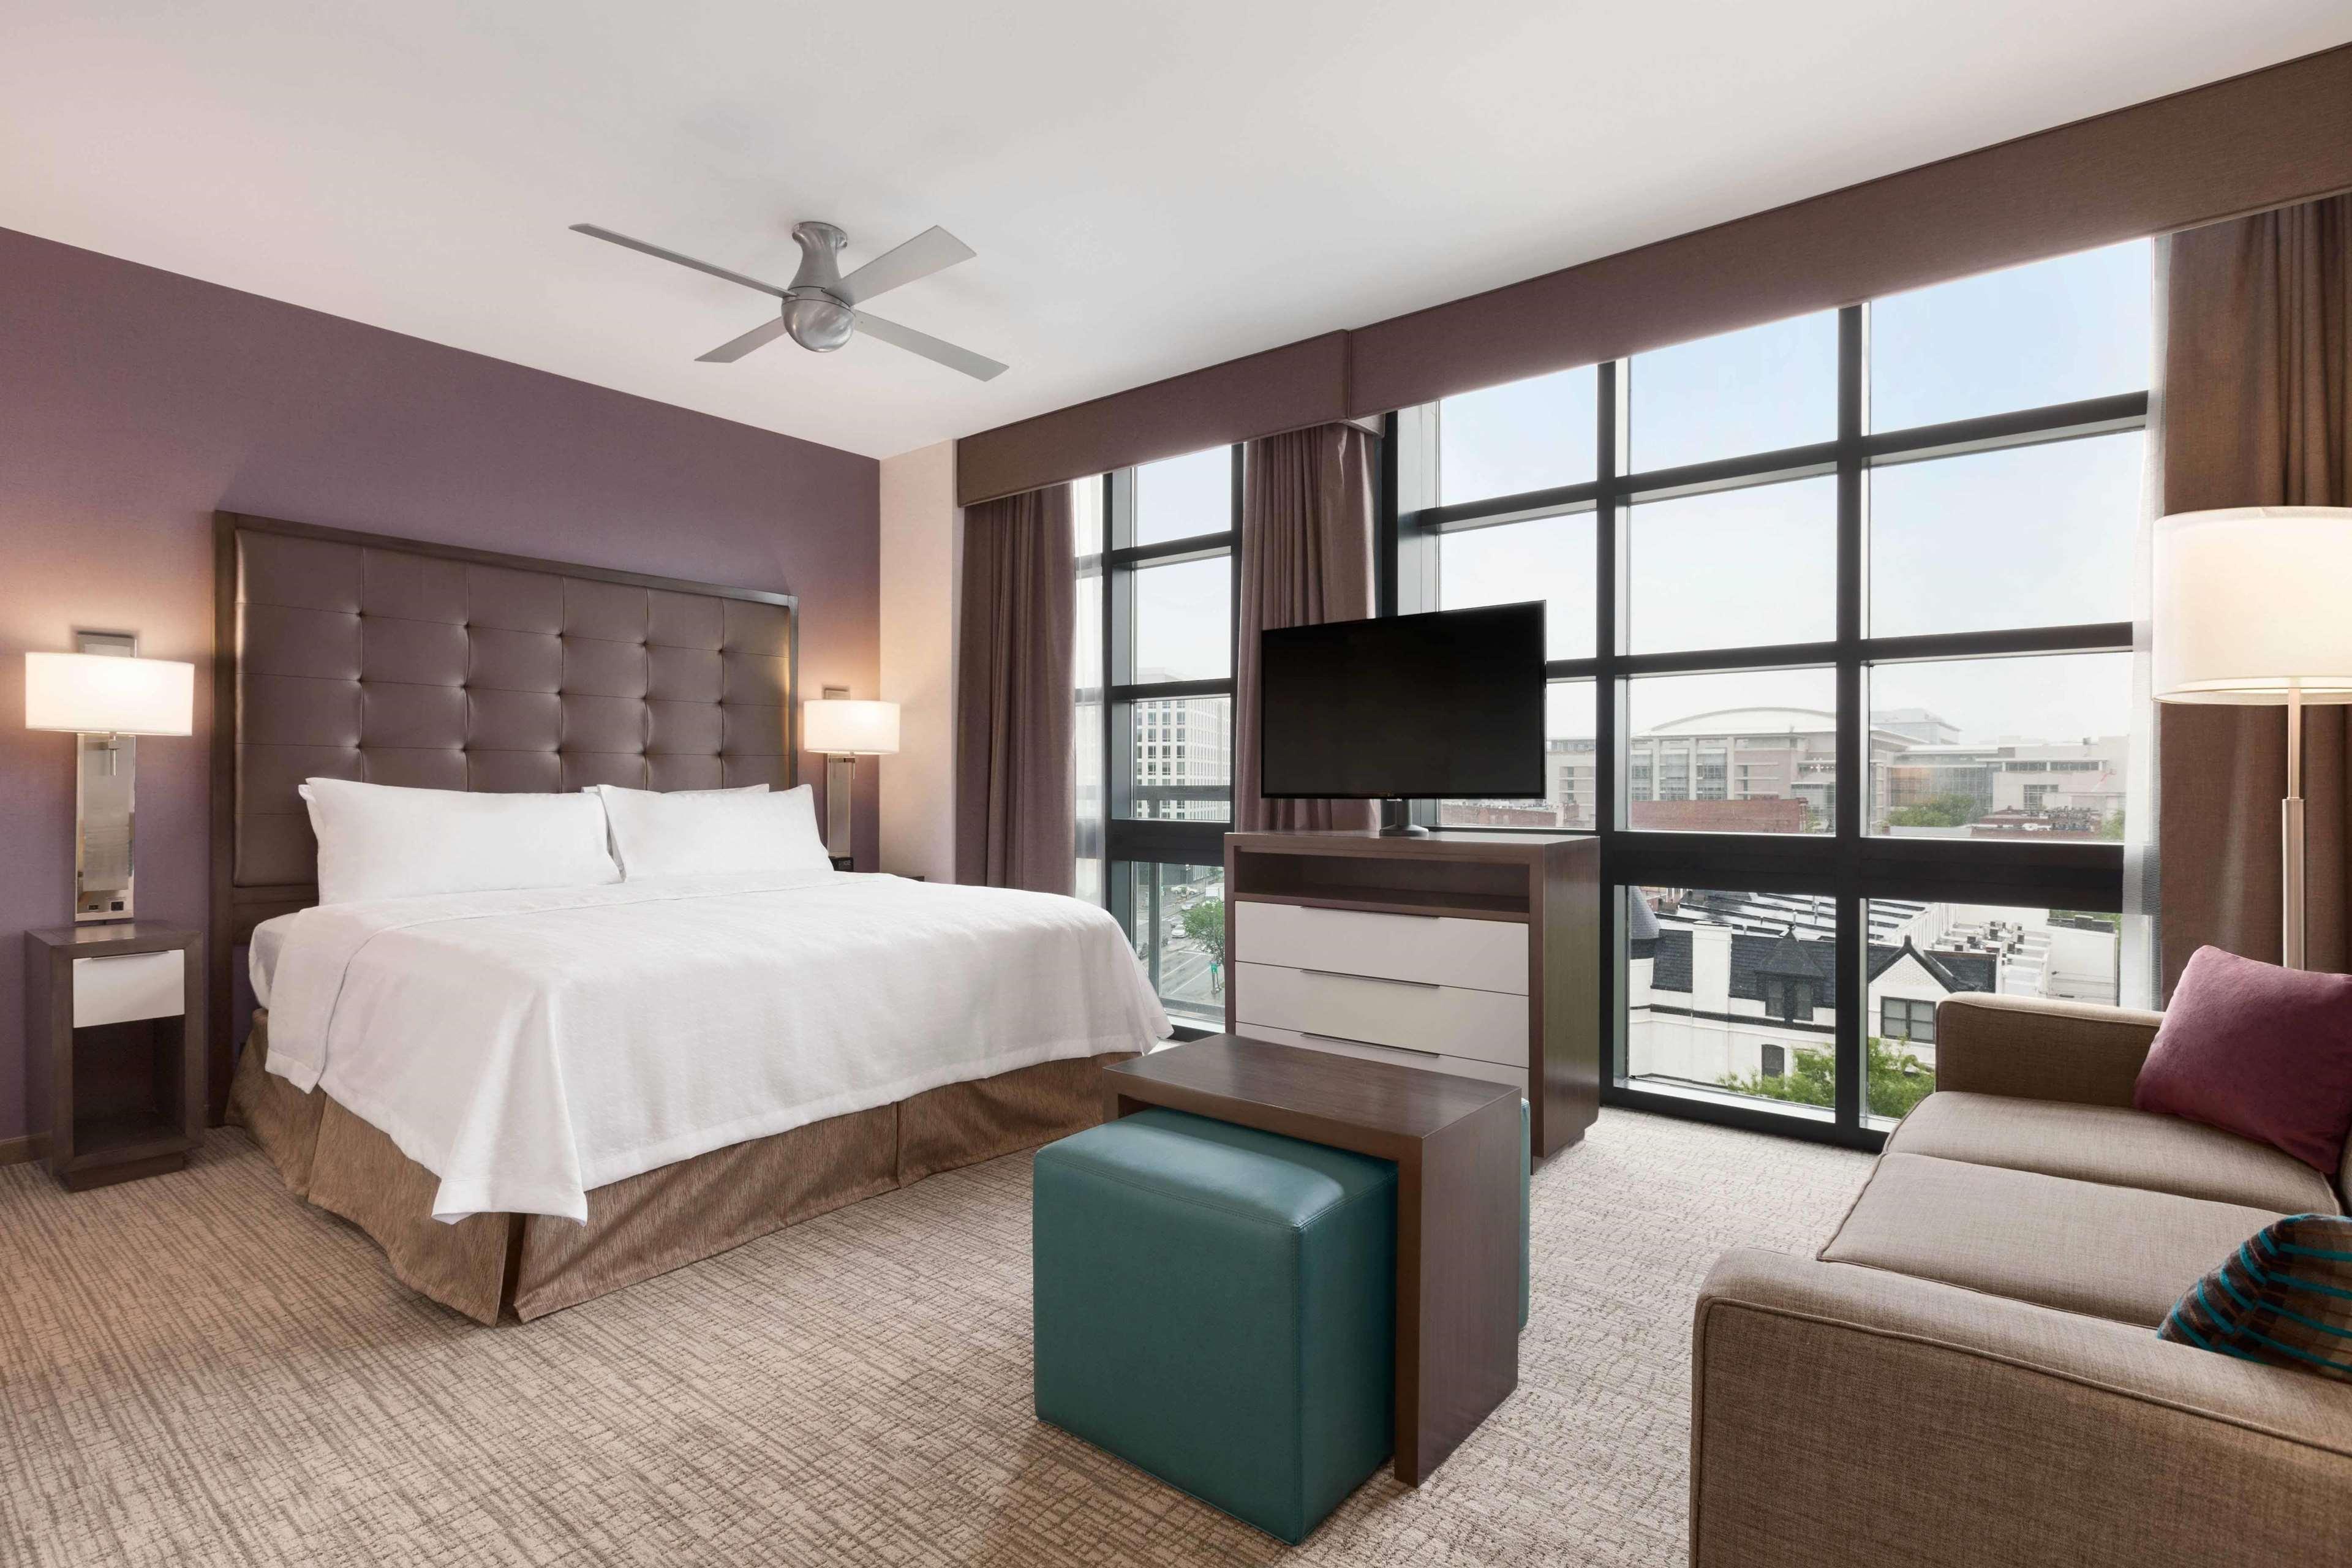 Homewood Suites by Hilton Washington DC Convention Center image 29